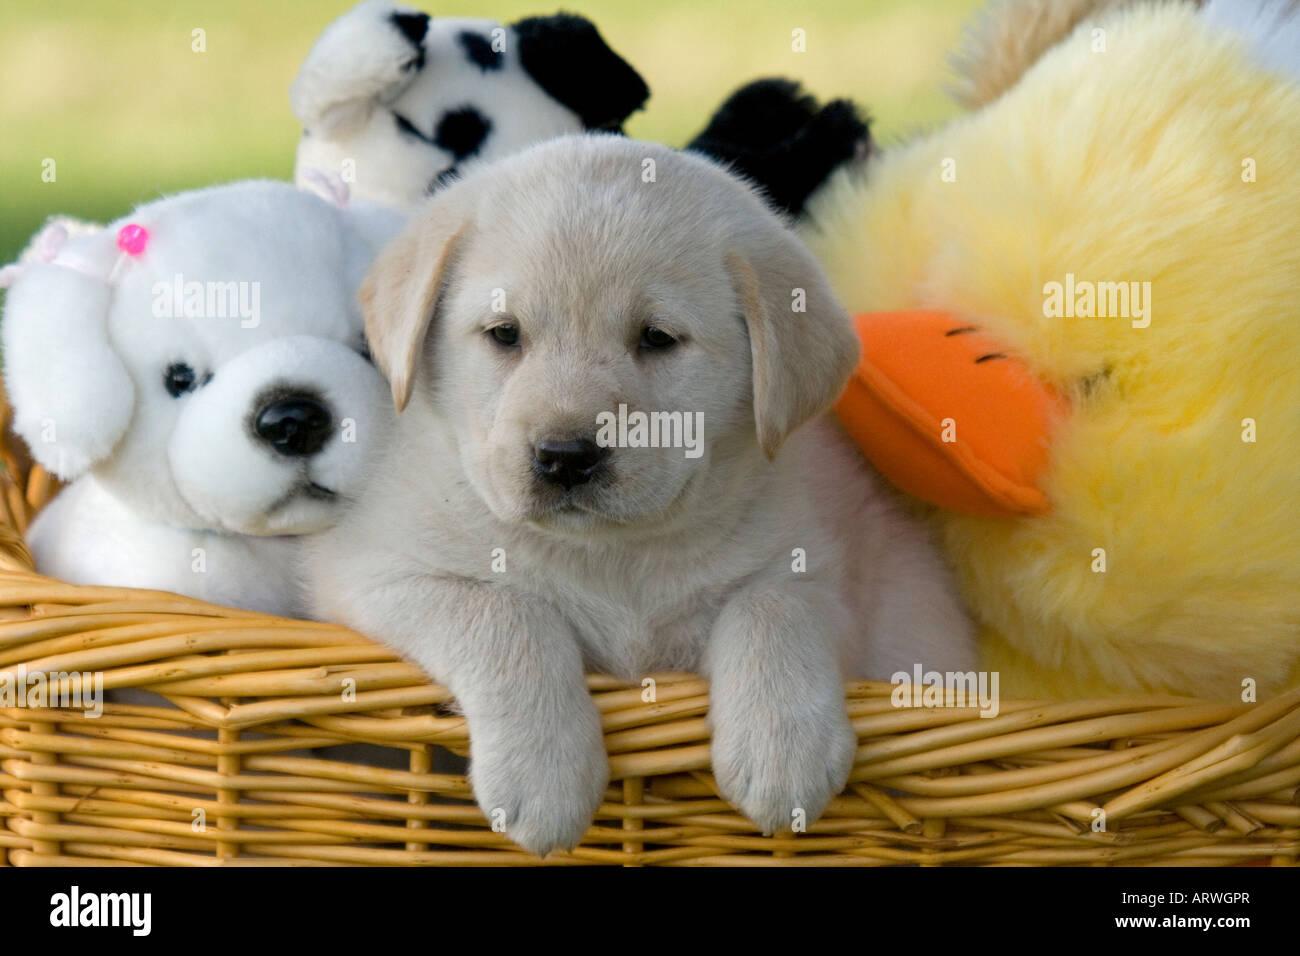 Yellow Labrador Retriever Akc Puppy In A Basket Full Of Stuffed